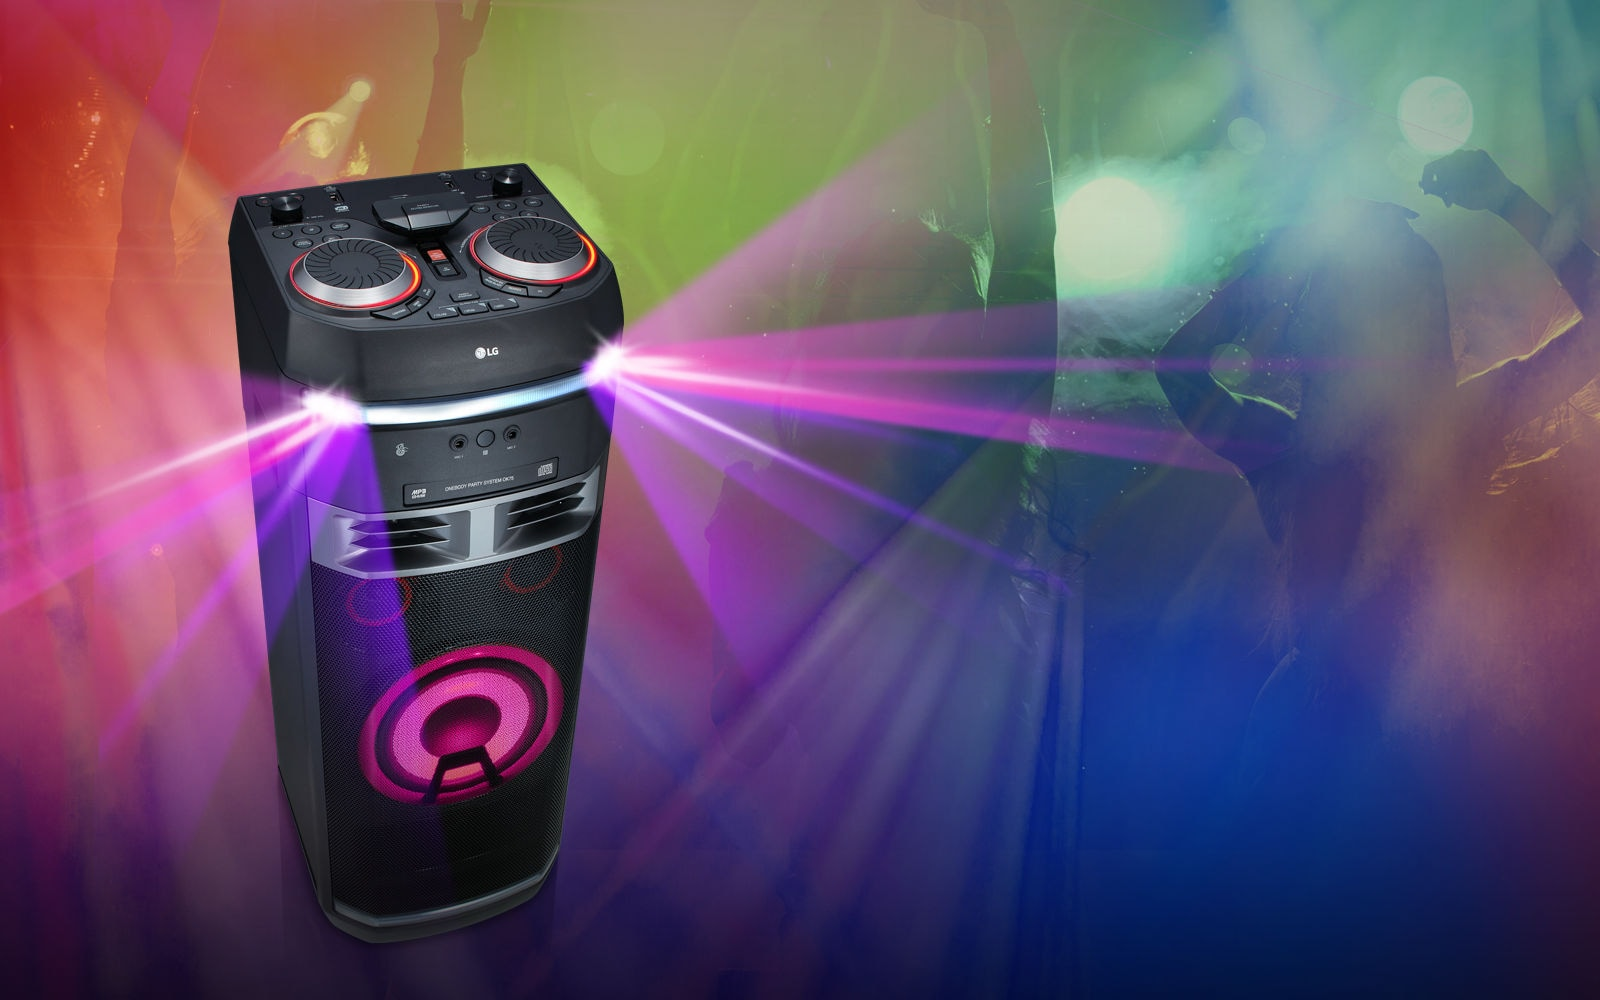 03_OK75_Light_Up_Your_Party_Desktop